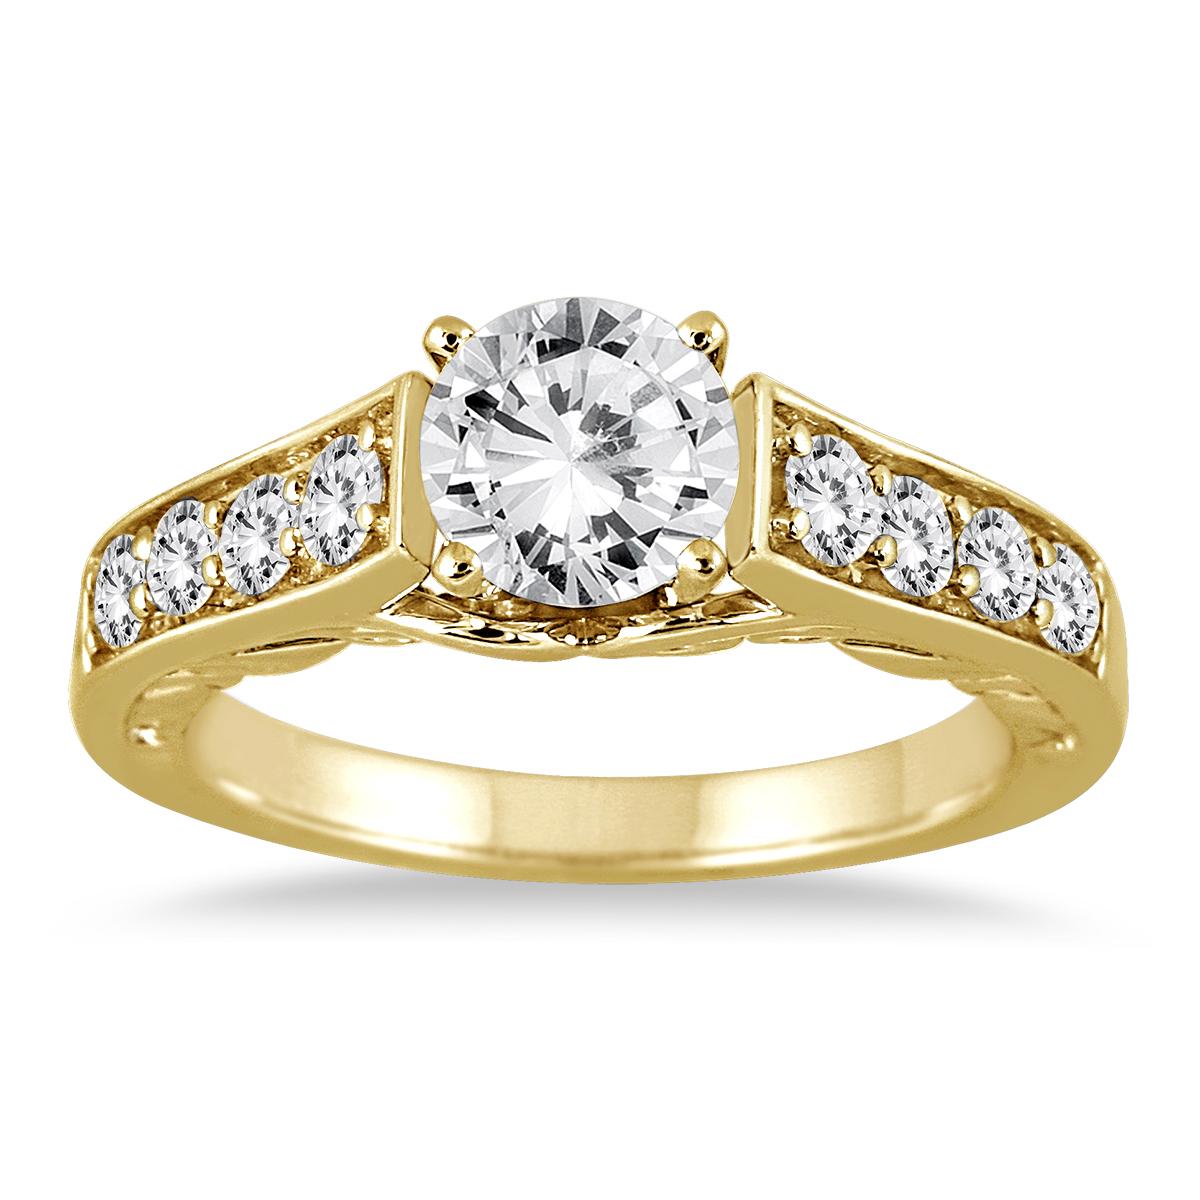 1 1/2 Carat TW Antique Diamond Ring in 14K Yellow Gold